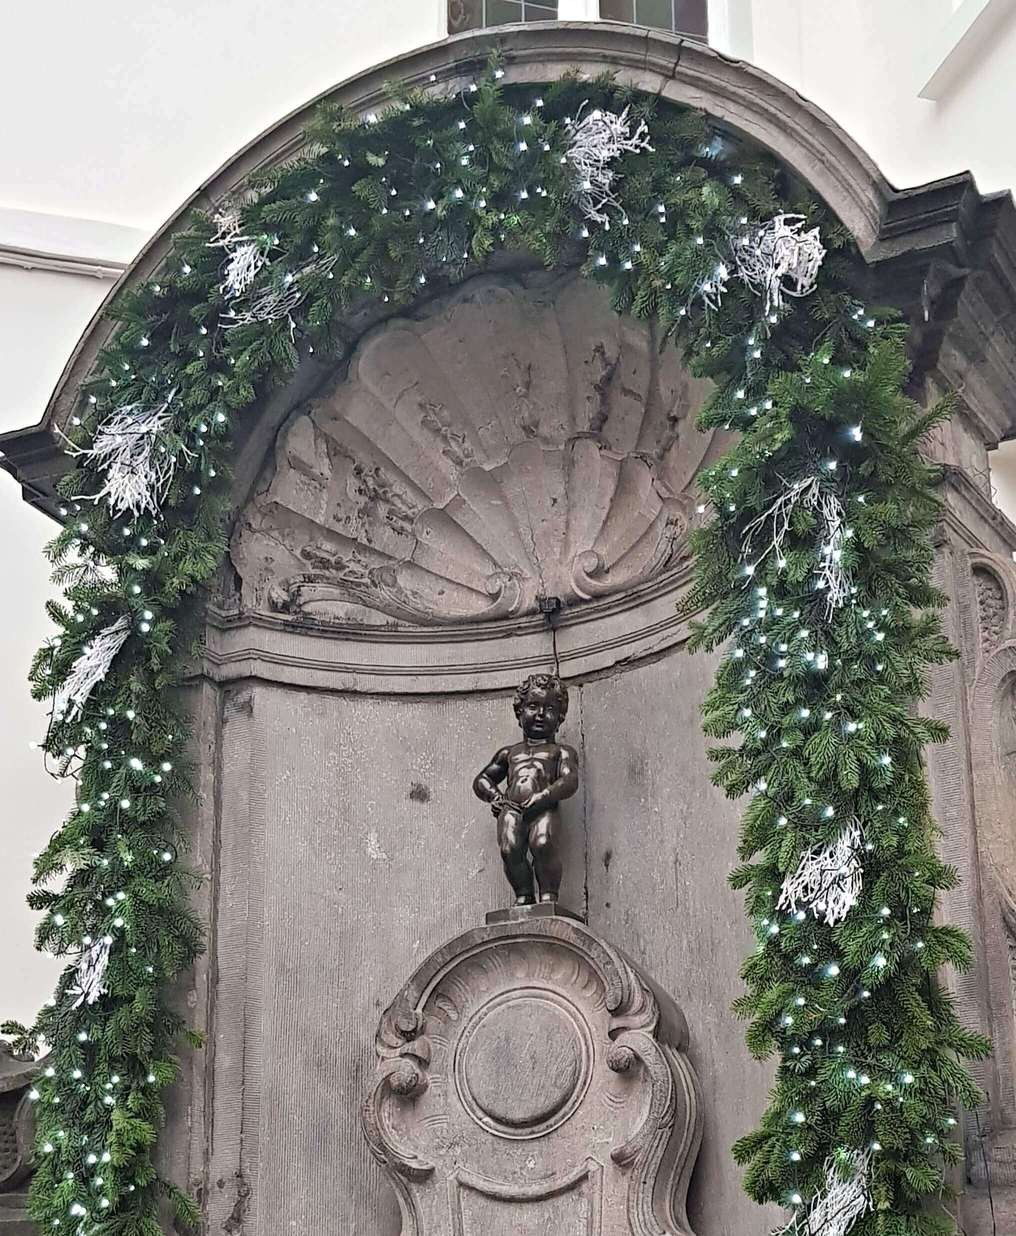 Brussels trip to Manneken-Pis Statue